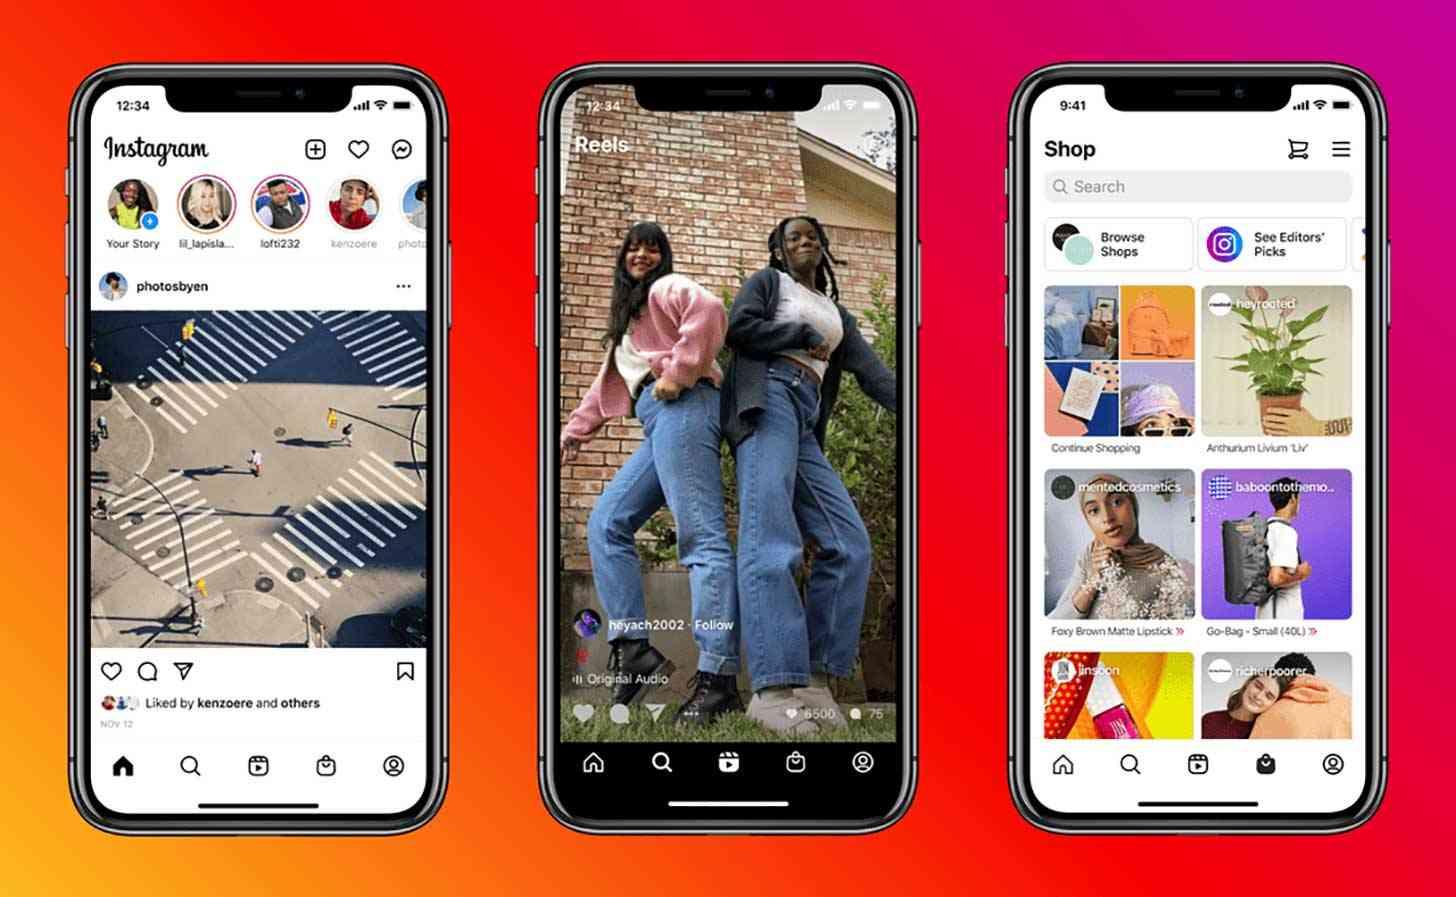 Instagram Reels, Shop home screen